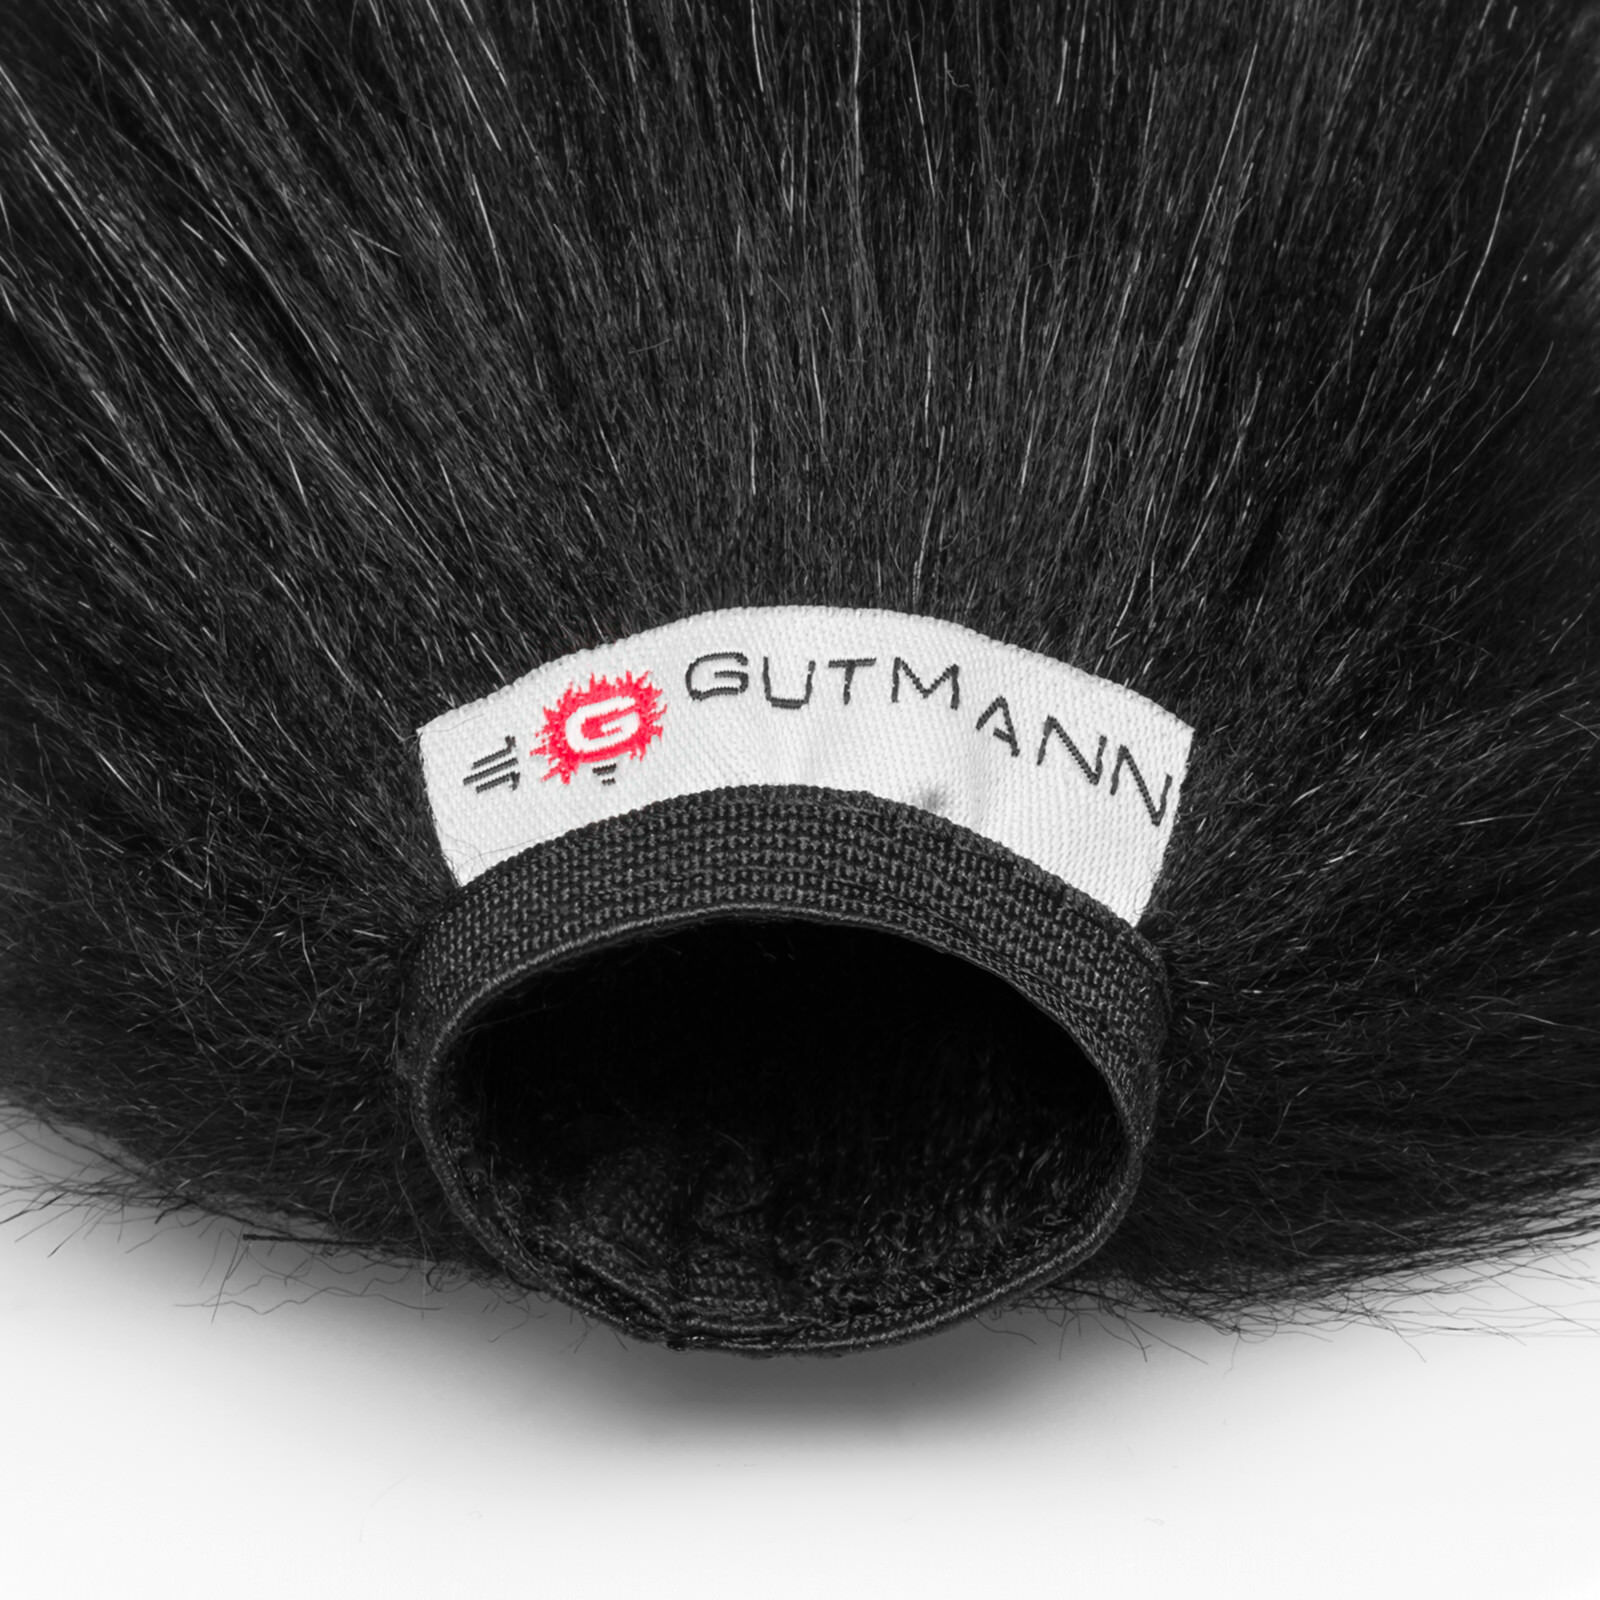 Gutmann Microphone Wind Protector For Vivanco Evm 298